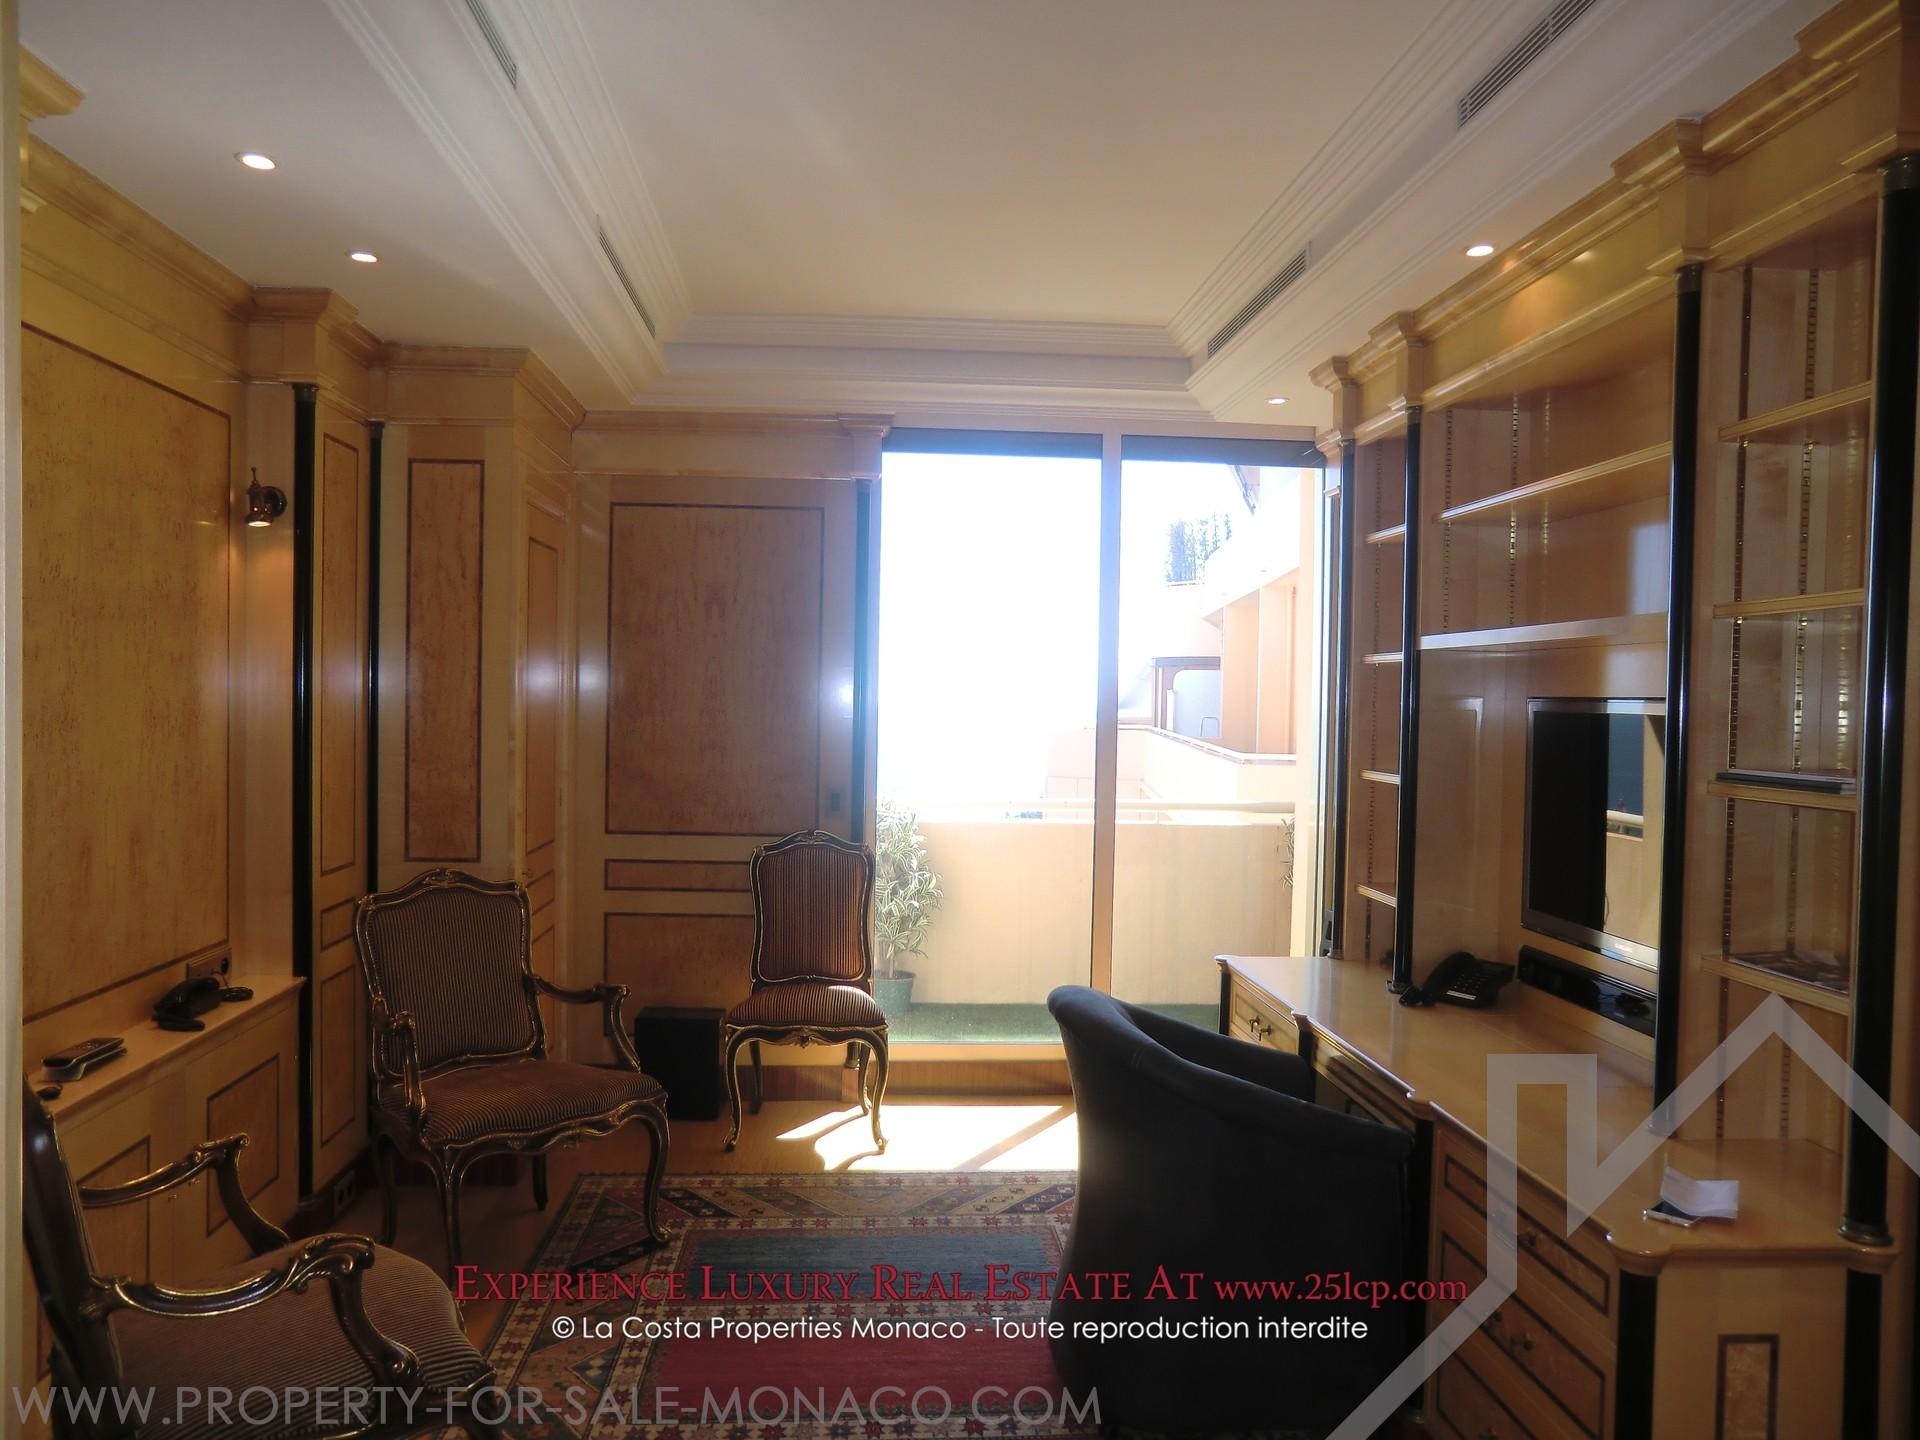 monte carlo bel appartement meubl propri t s vendre monaco. Black Bedroom Furniture Sets. Home Design Ideas